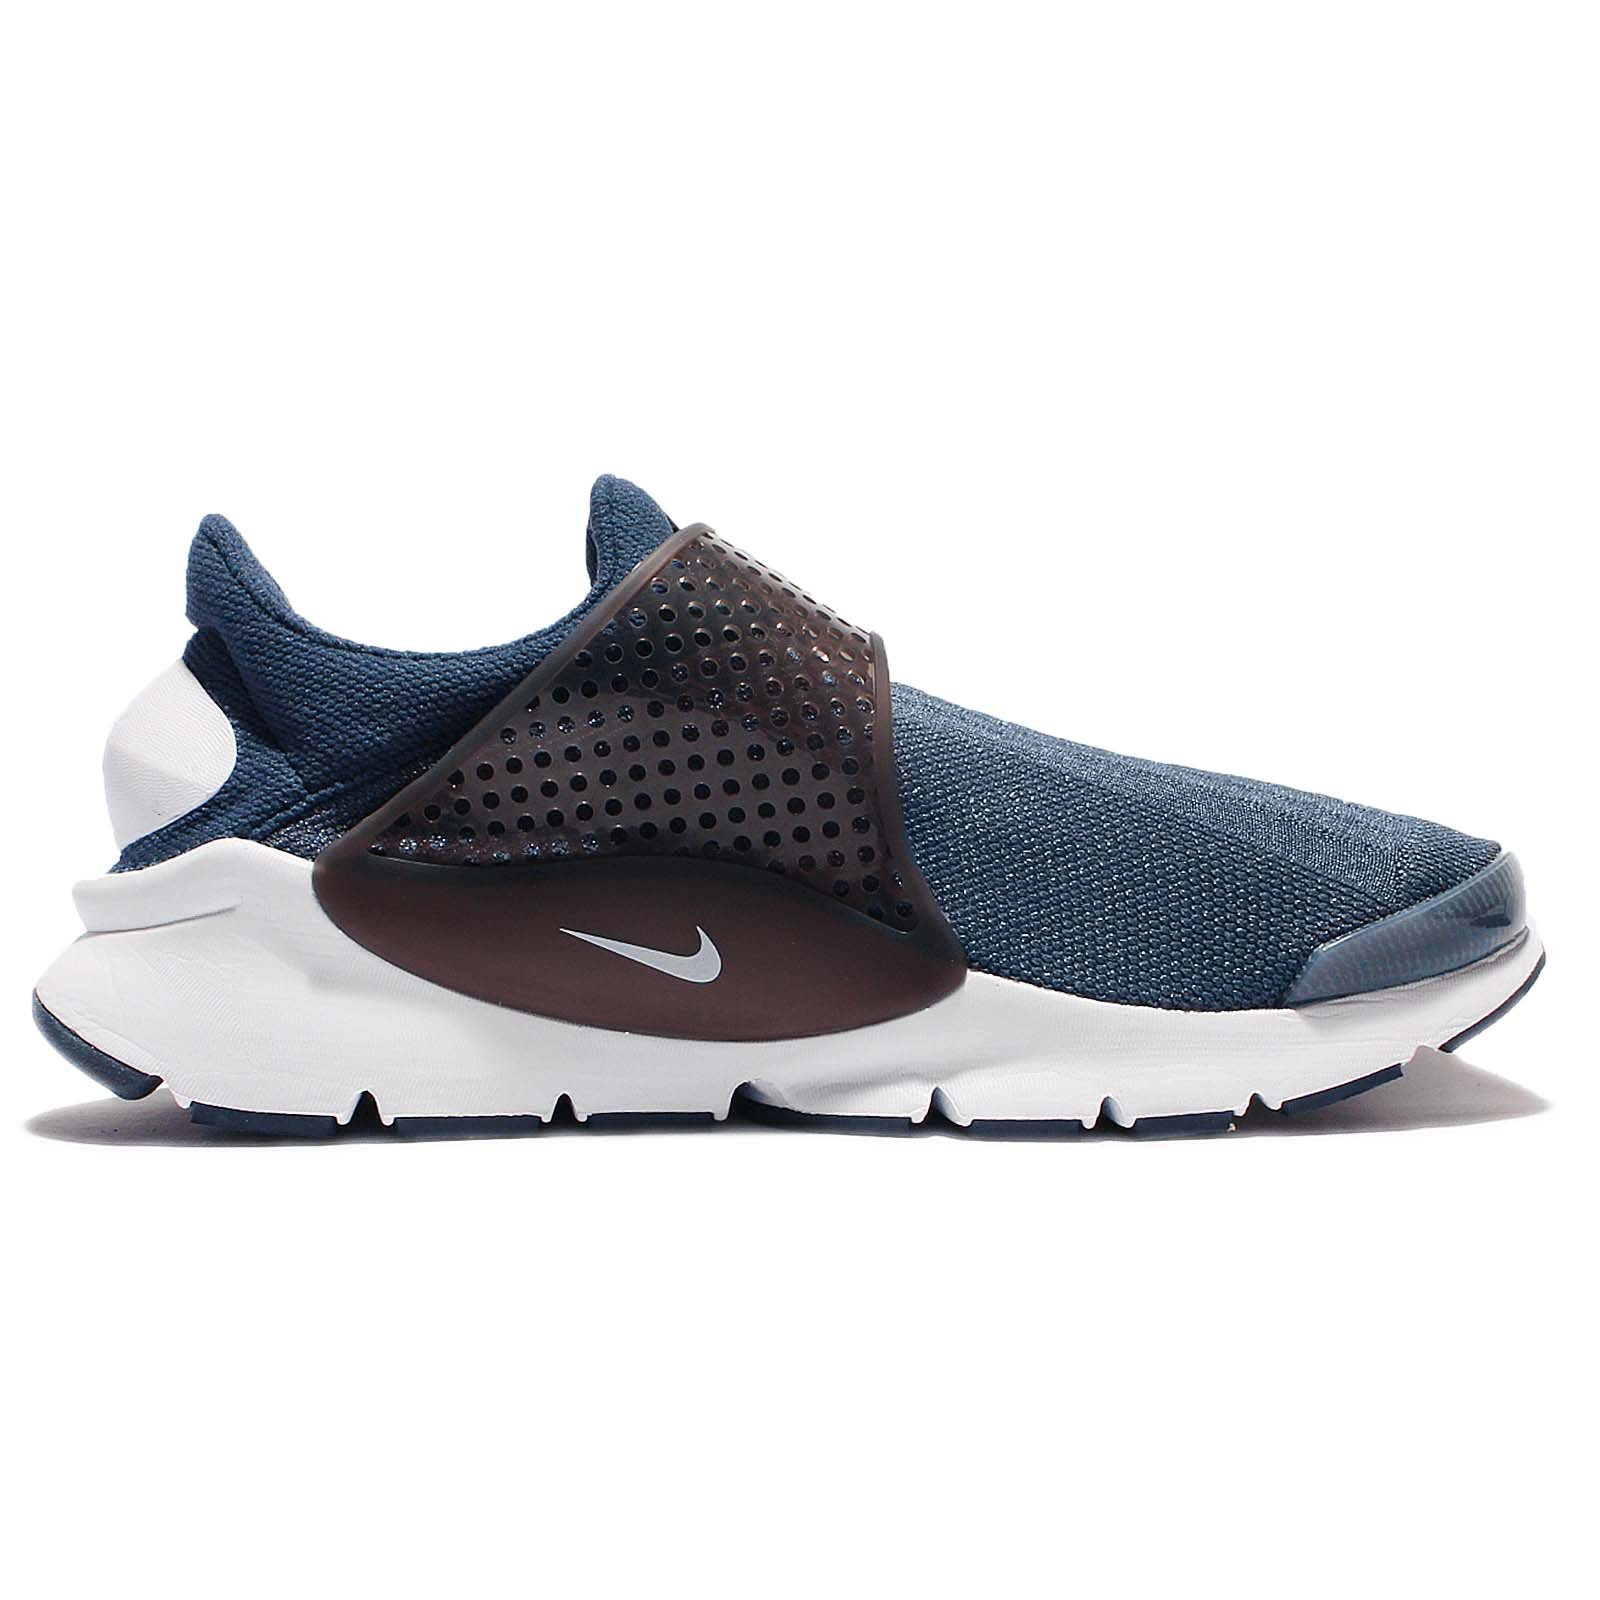 Nike - Sock Dart Squadron Blue - 819686404 - Größe: 42.5